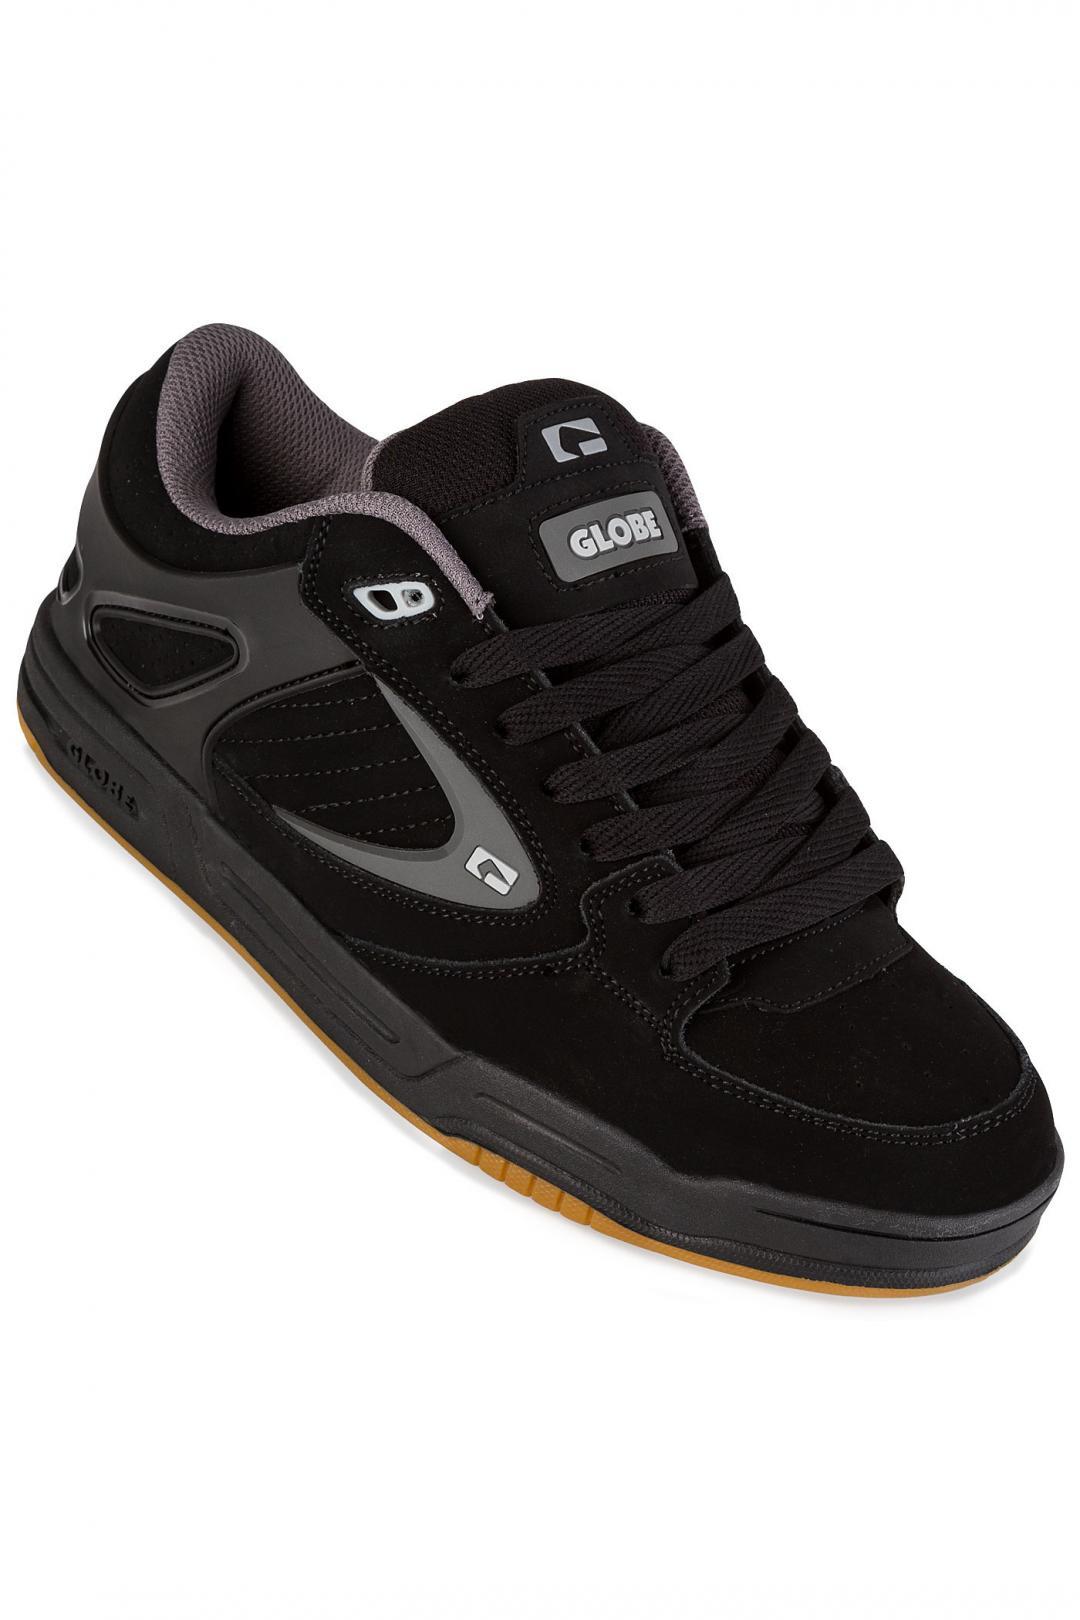 Uomo Globe Agent black black charcoal   Sneakers low top